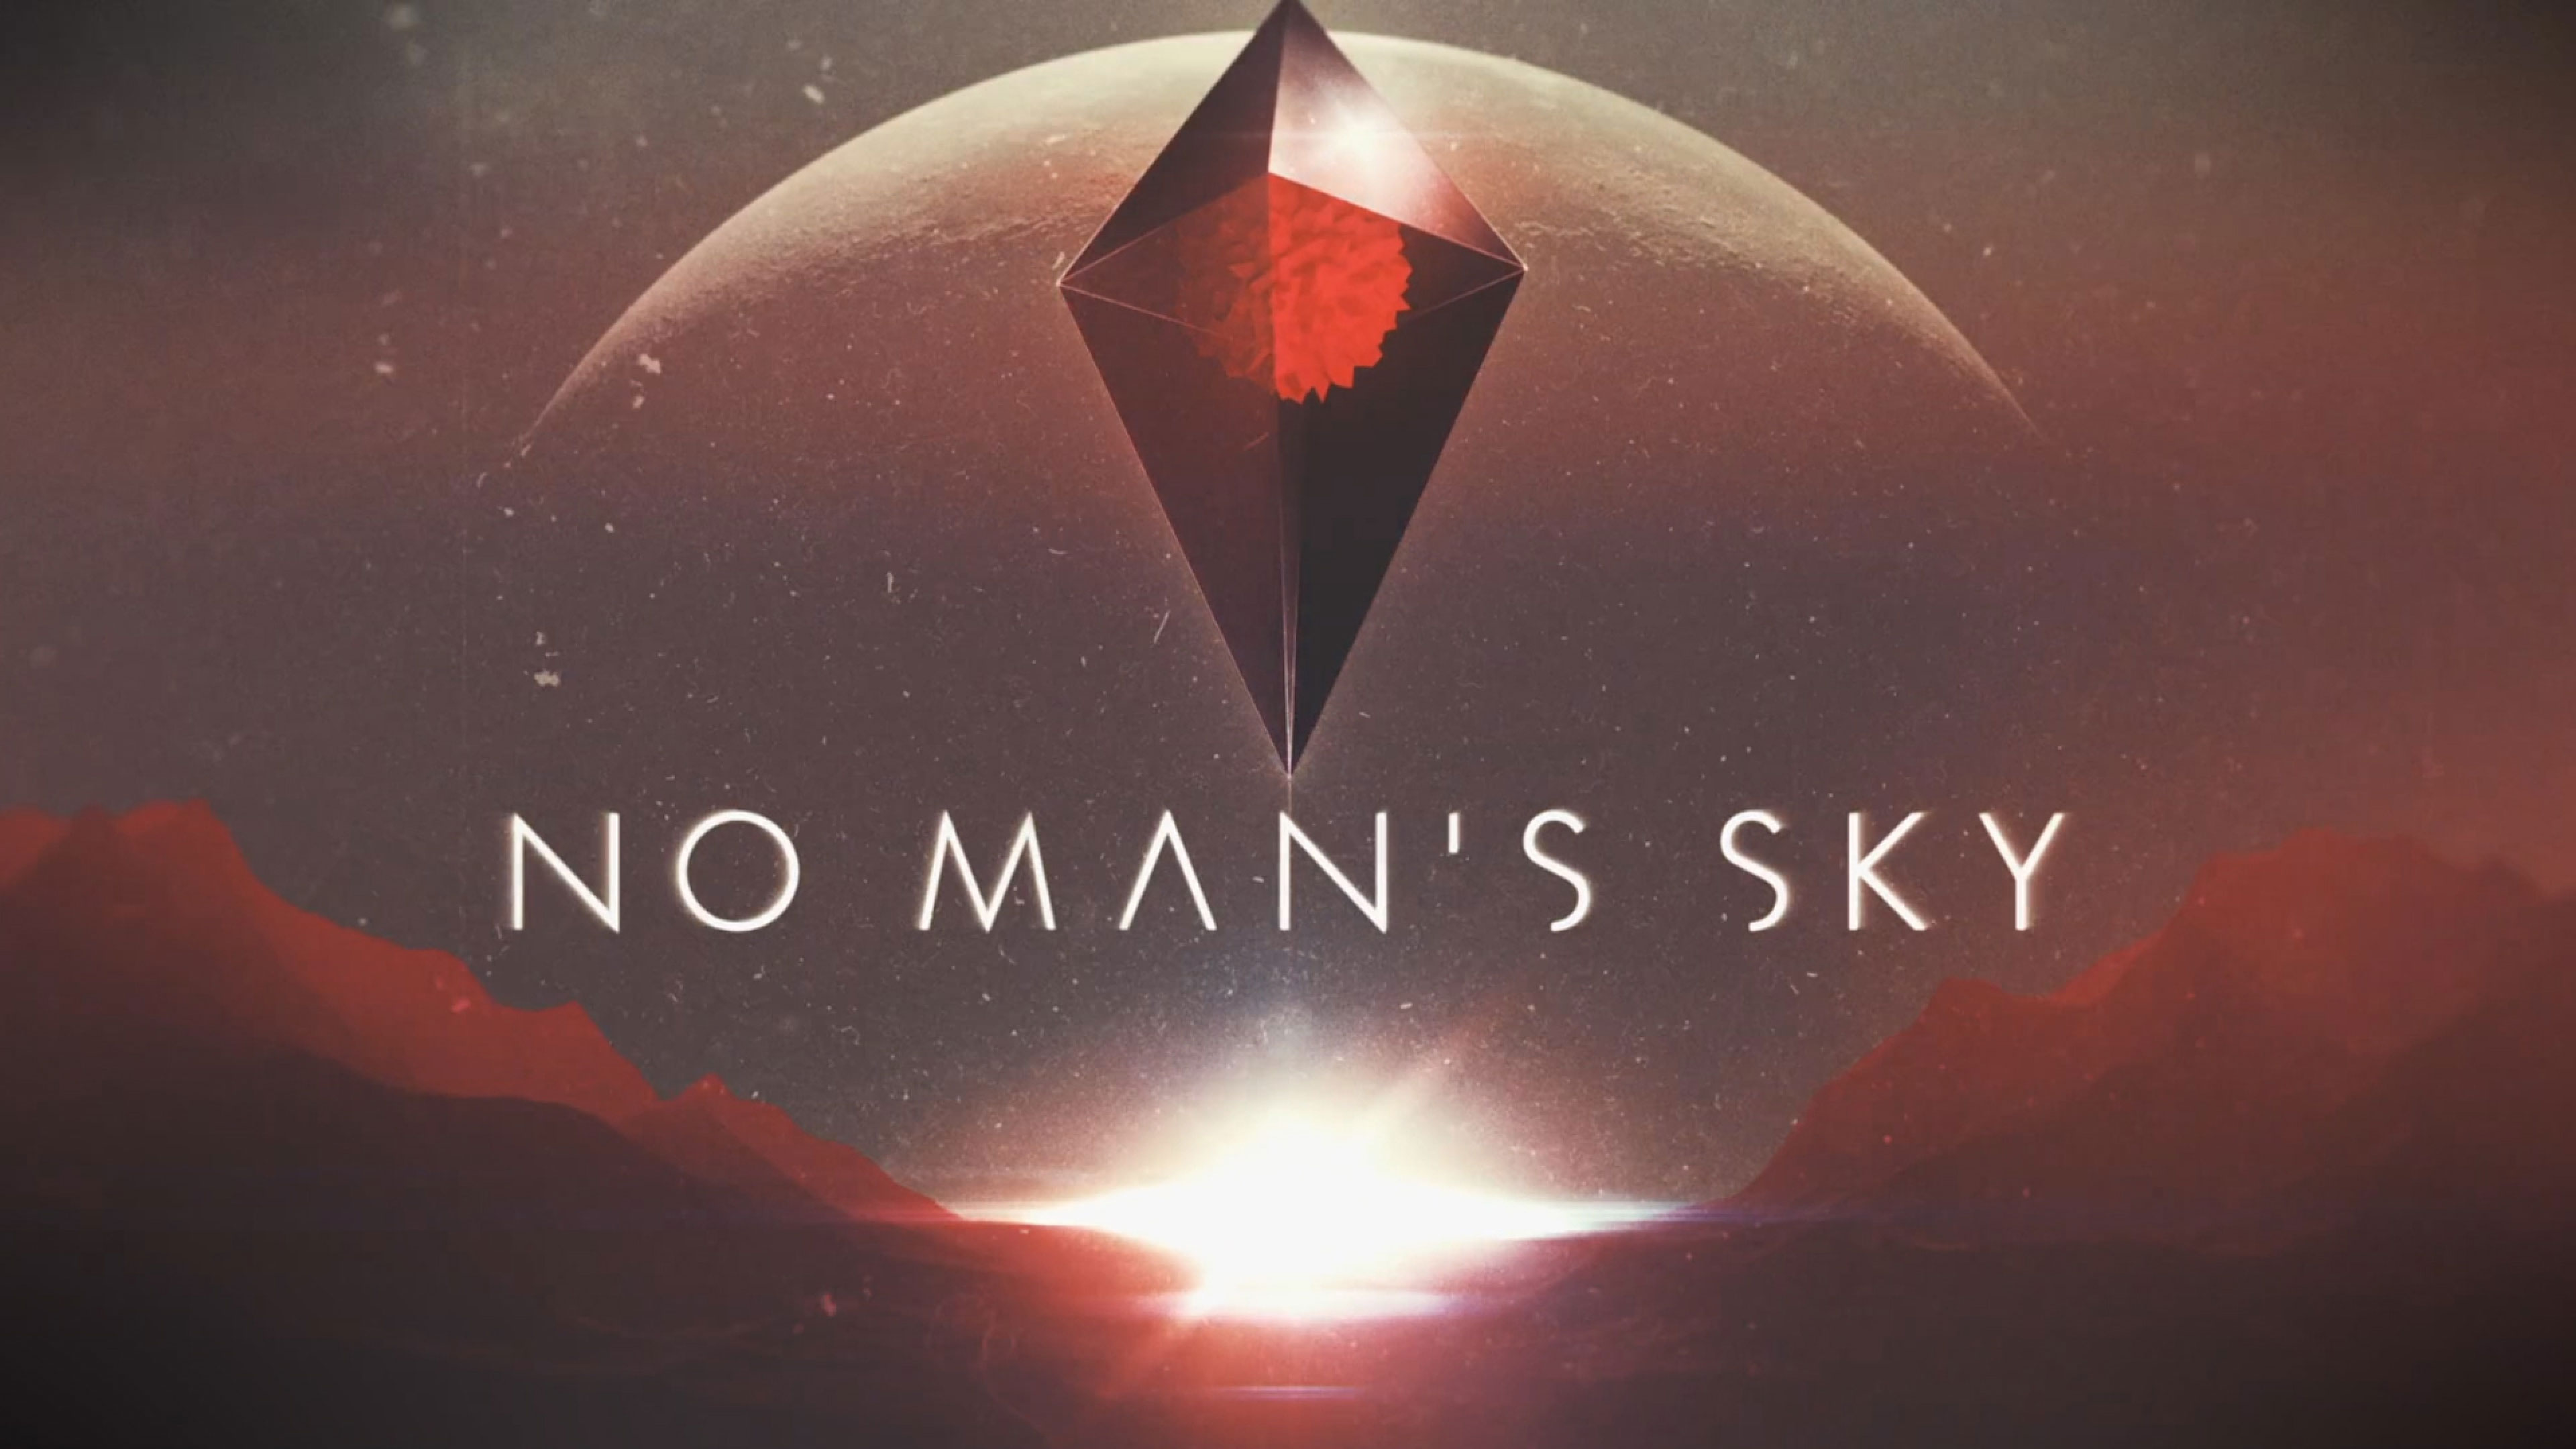 Gamer Has Reached the Center of No Man's Sky